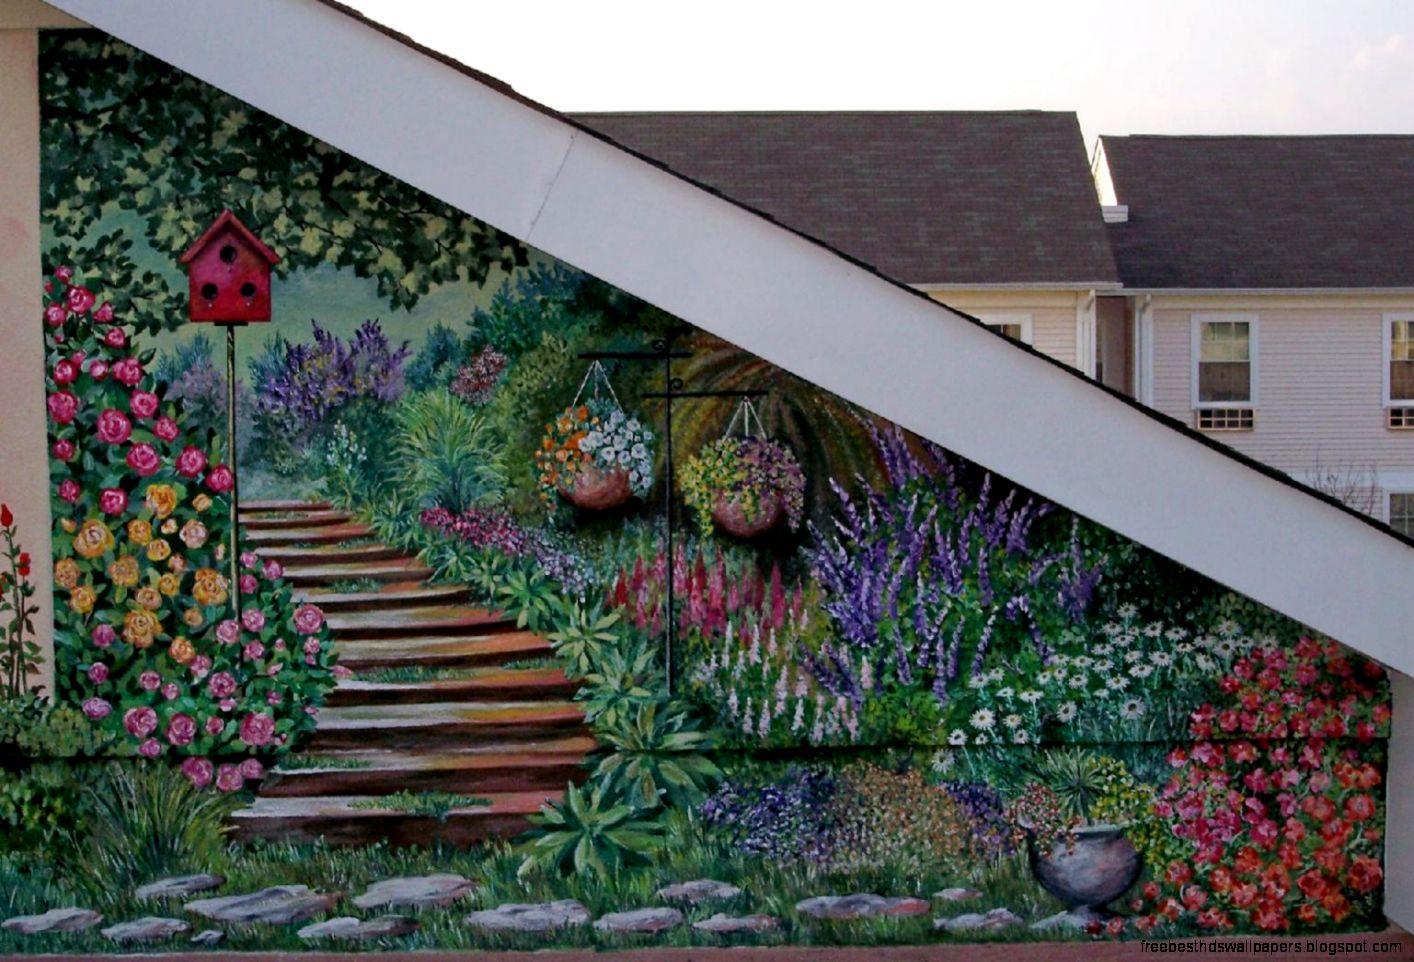 Wall Murals For Outdoor Walls Wallpaper | Free Best Hd Wallpapers